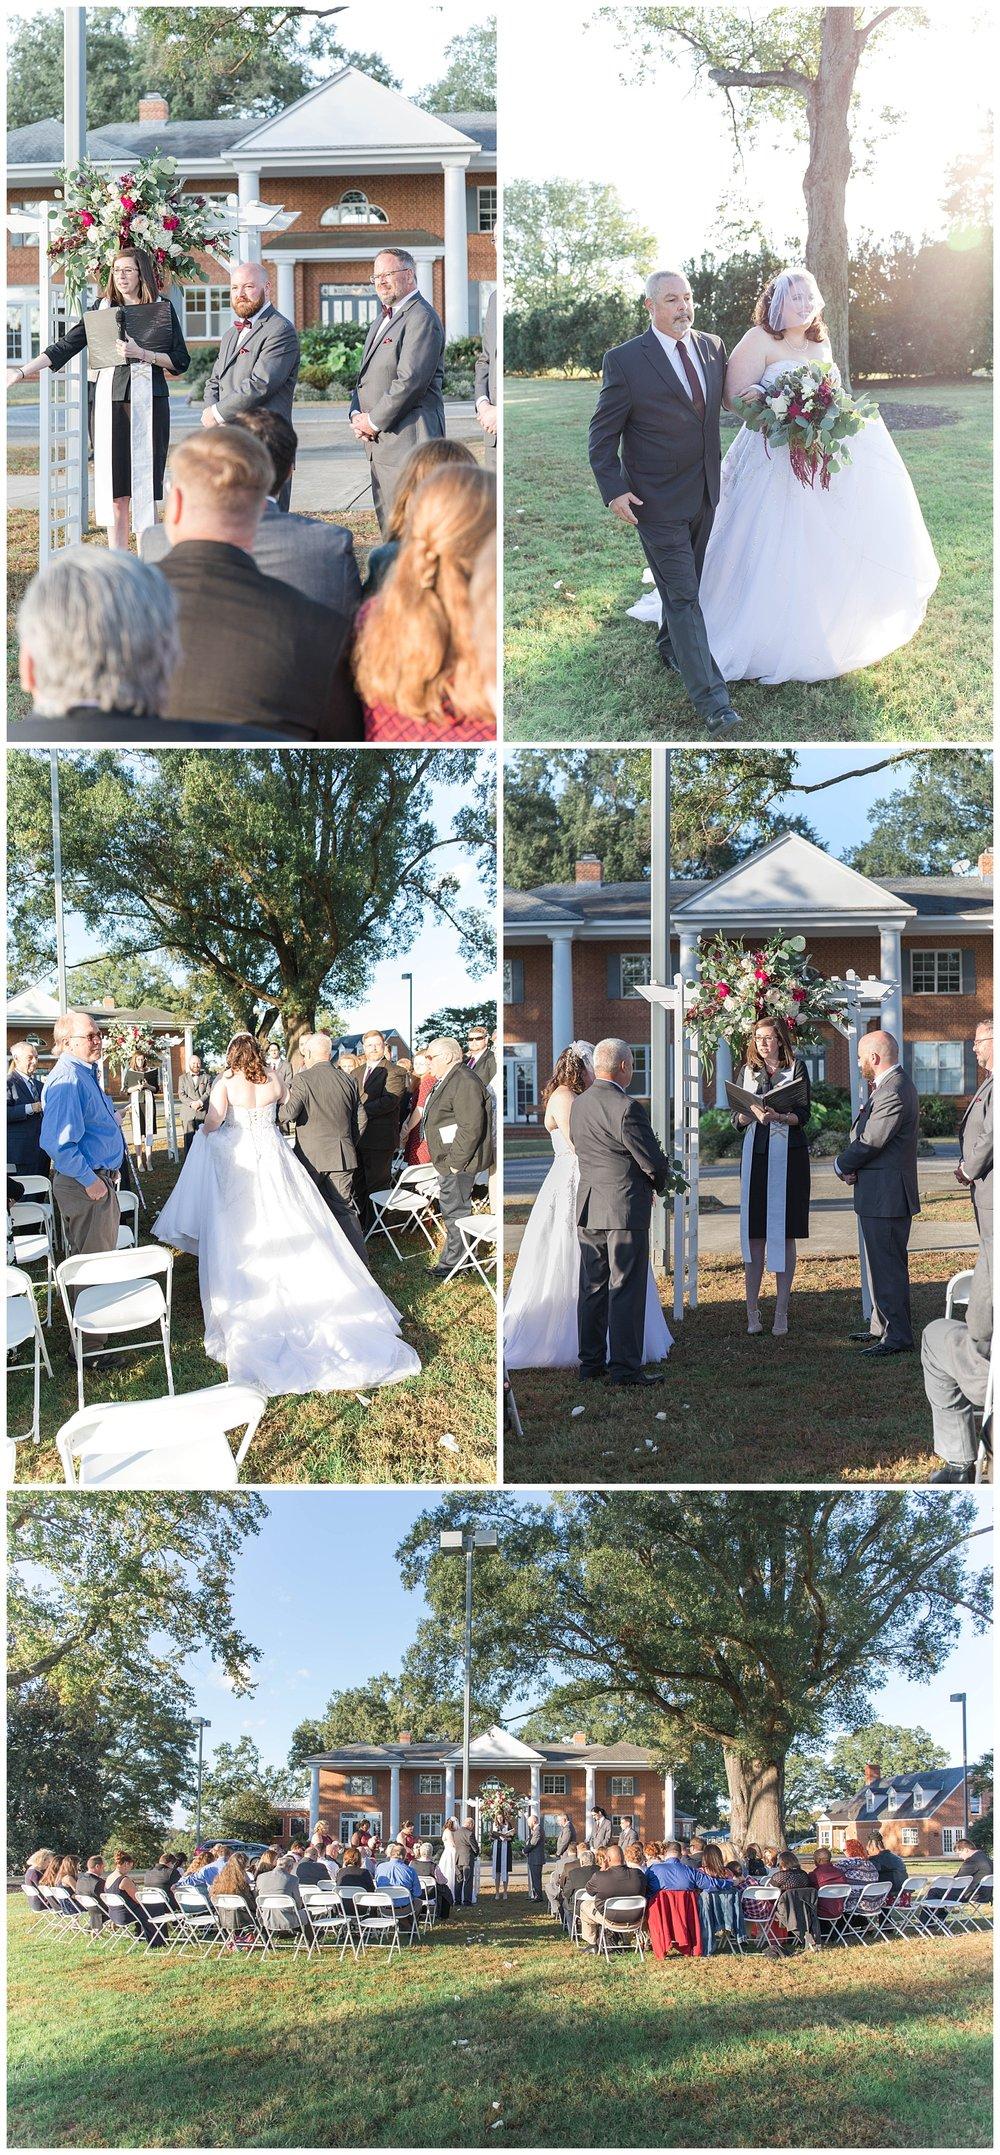 Richmond VA Wedding Photographer - MJ Mendoza | Meadow Event Park Wedding